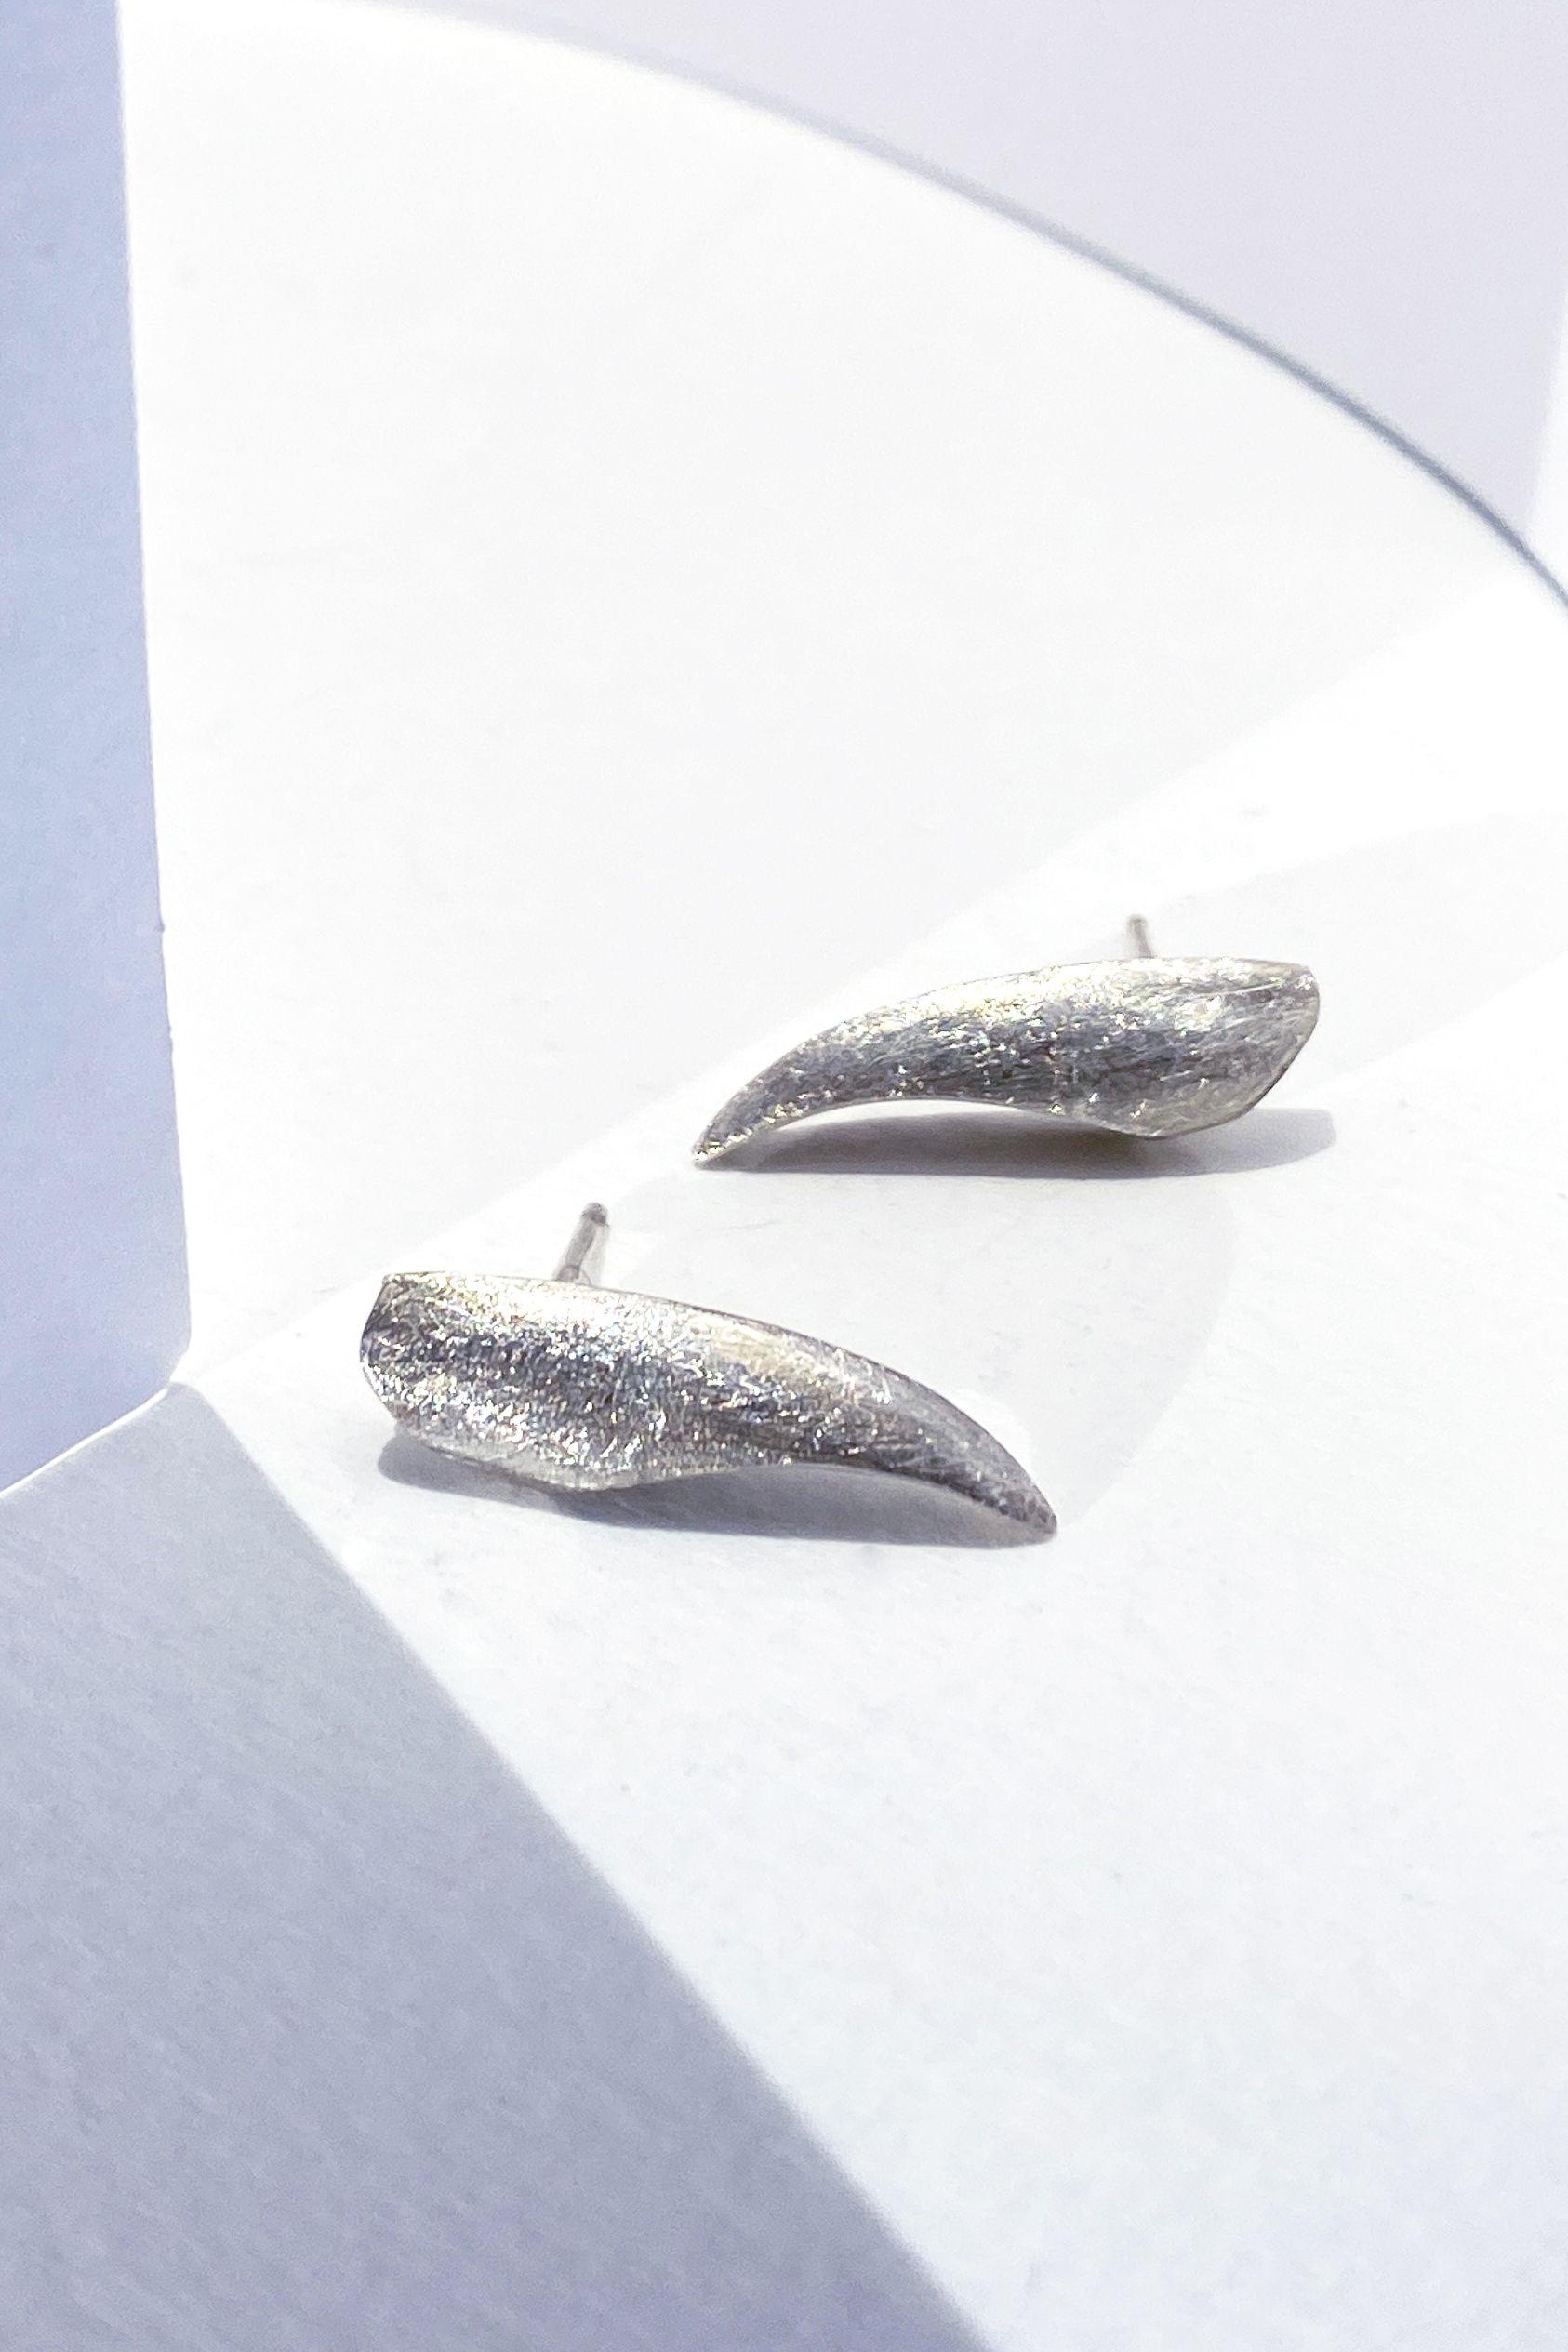 Small Birds Of Paradise Stud Earrings Flower Silver Earrings For Romantic Women Floral And Artistic Jewelry In 2020 Artistic Jewelry Lovely Earrings Silver Earrings Handmade